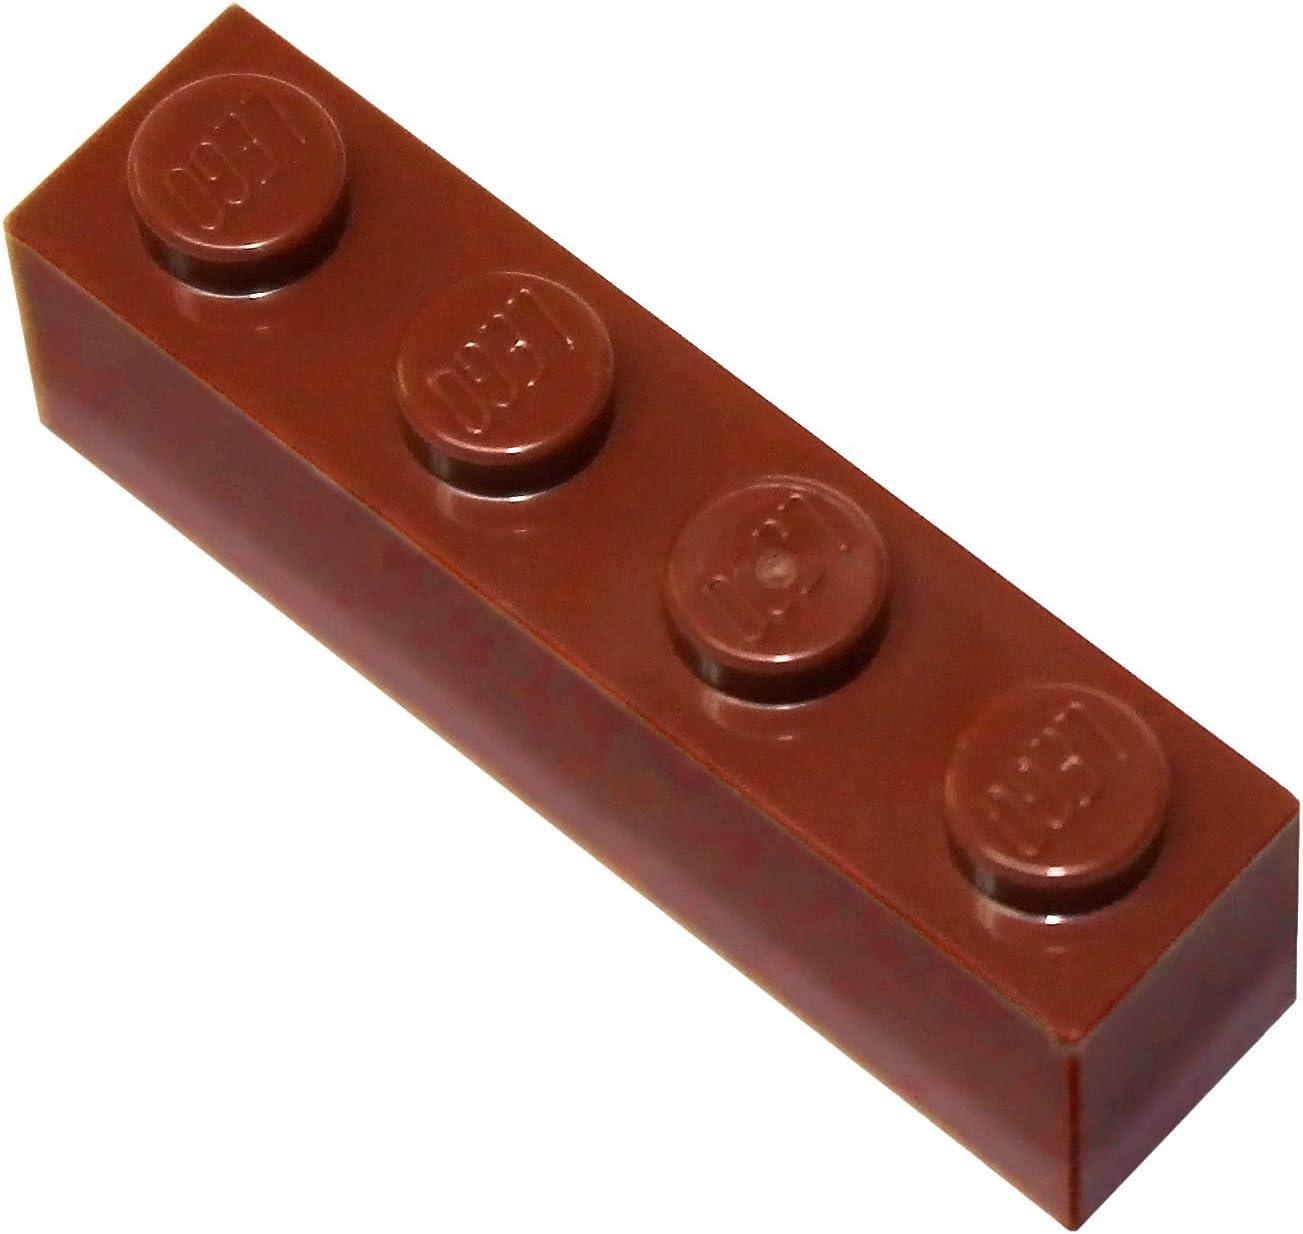 LEGO Parts and Pieces: Reddish Brown 1x4 Brick x100